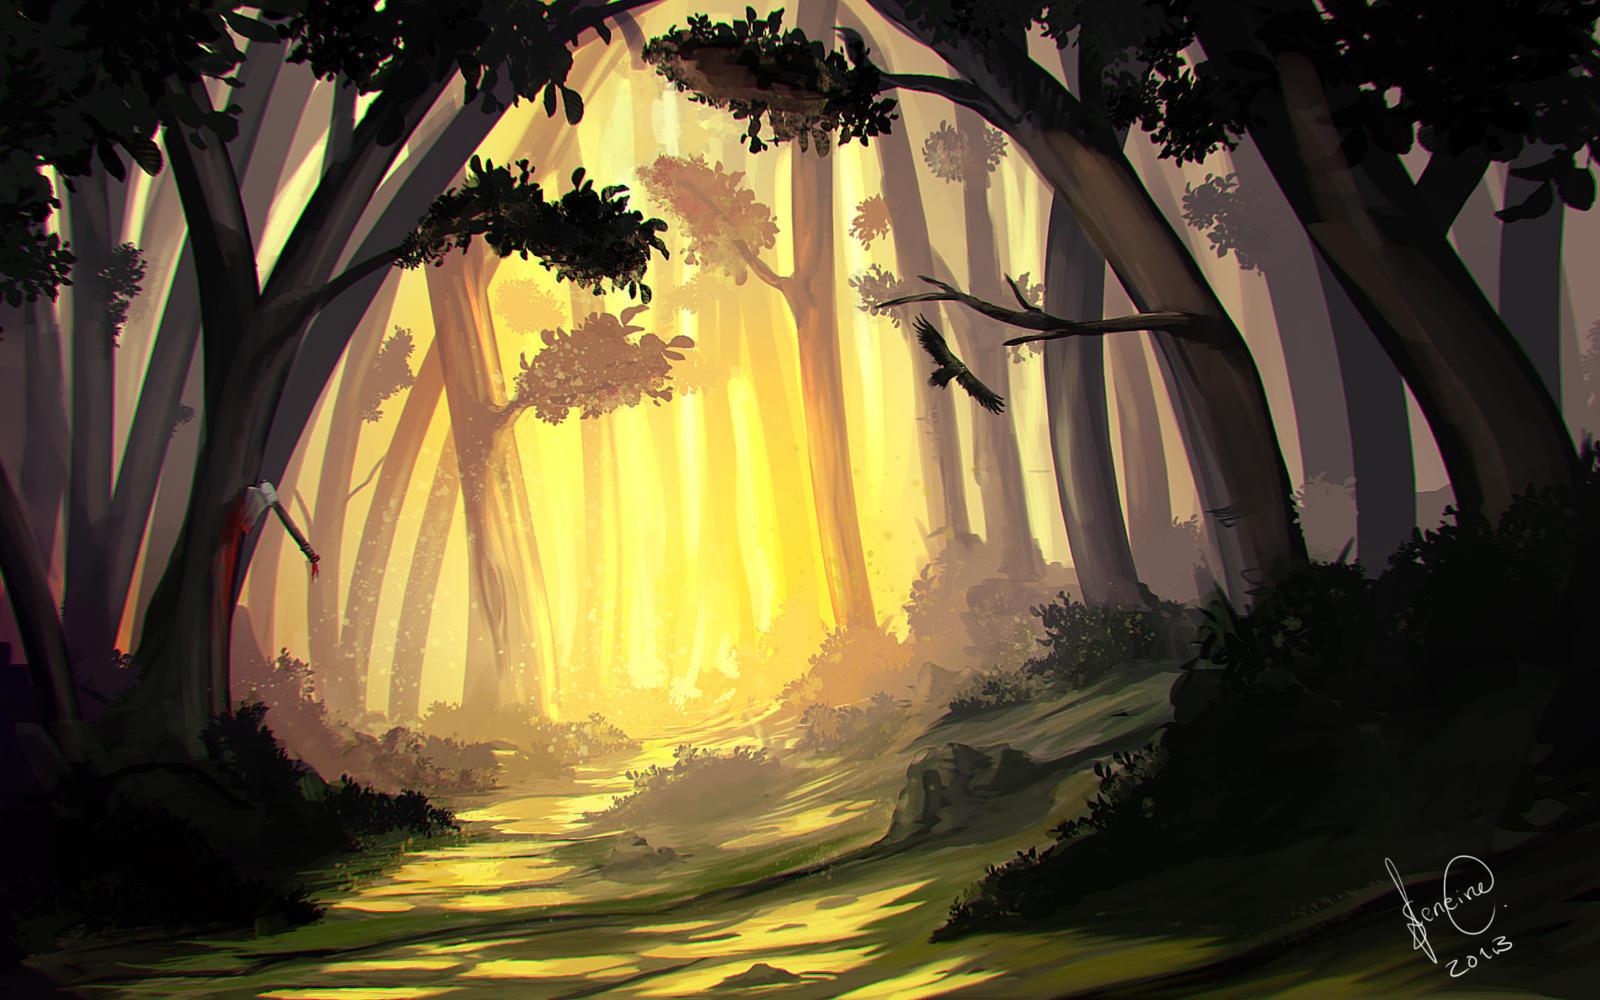 Forest Speedy by xpsam